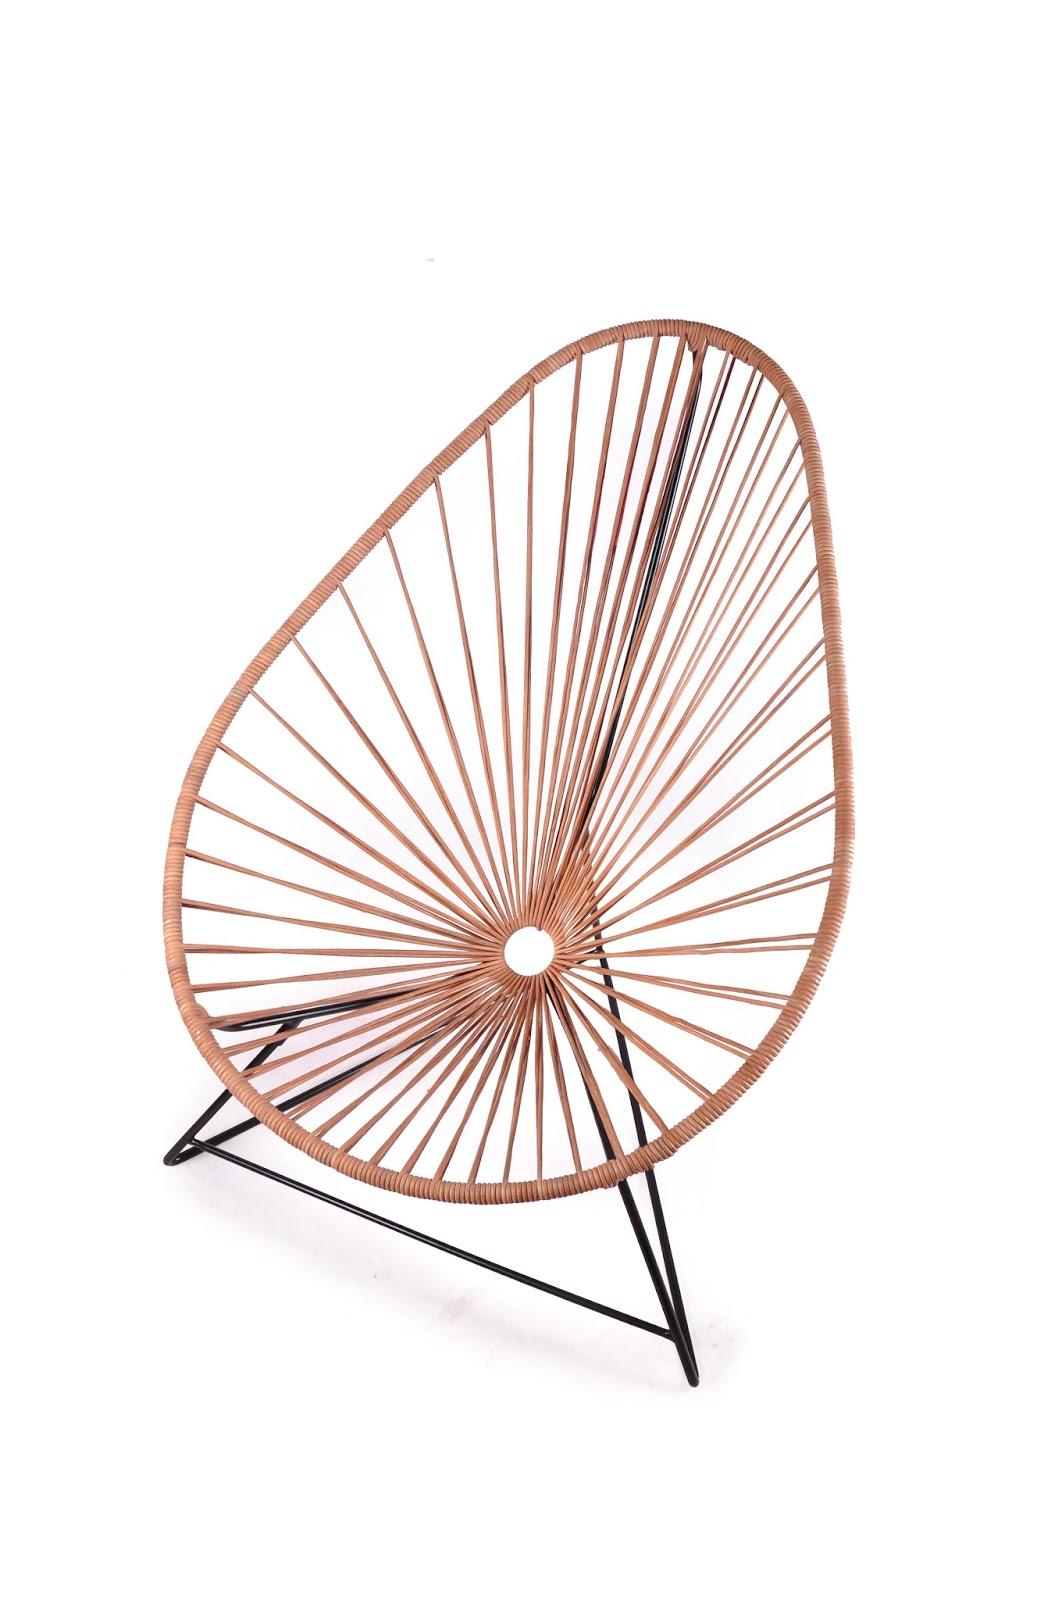 mobilier scoubidou. Black Bedroom Furniture Sets. Home Design Ideas